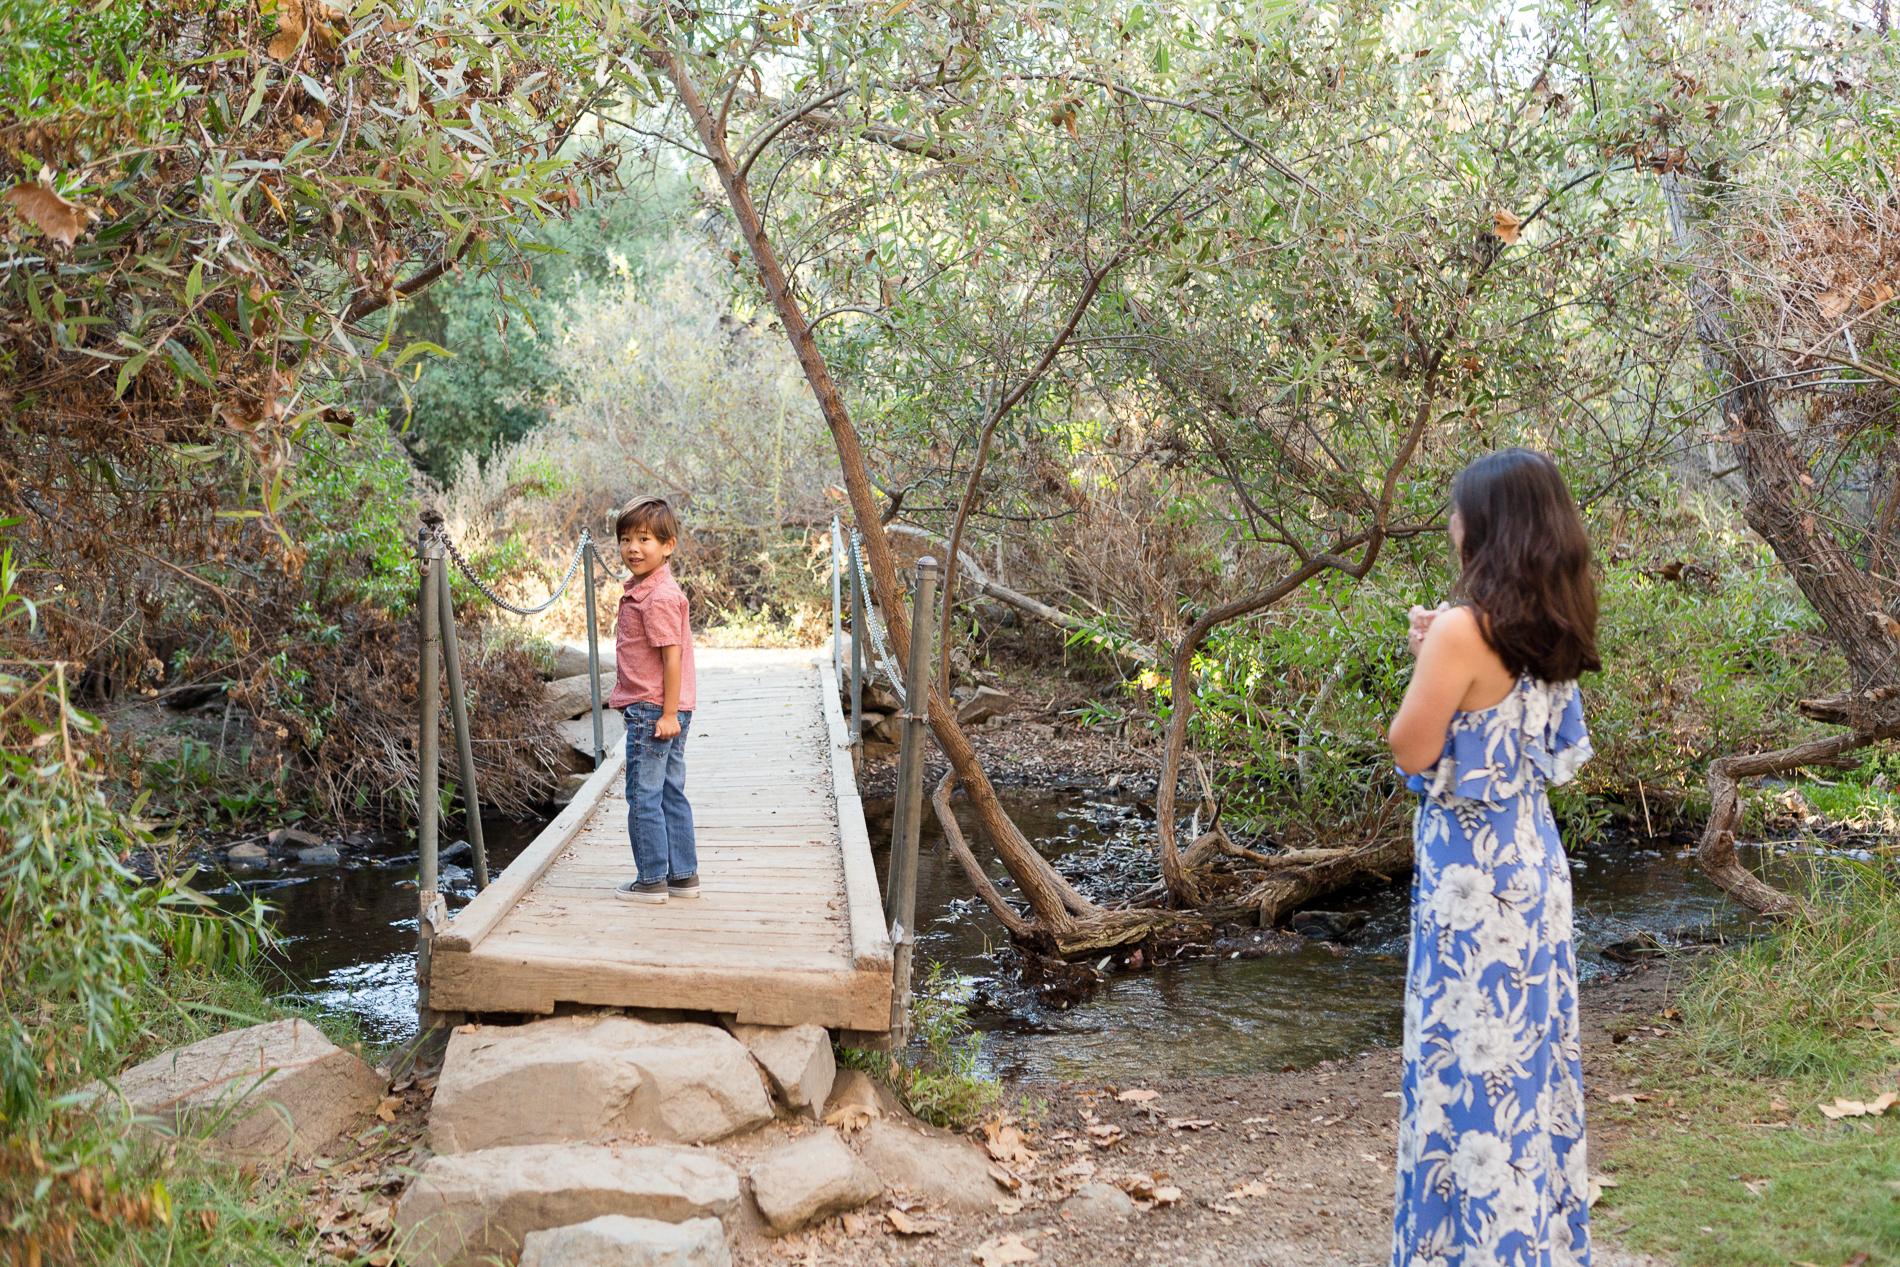 San Diego Family Photographer Los Penasquitos Canyon Christine Dammann Photography-12.jpg